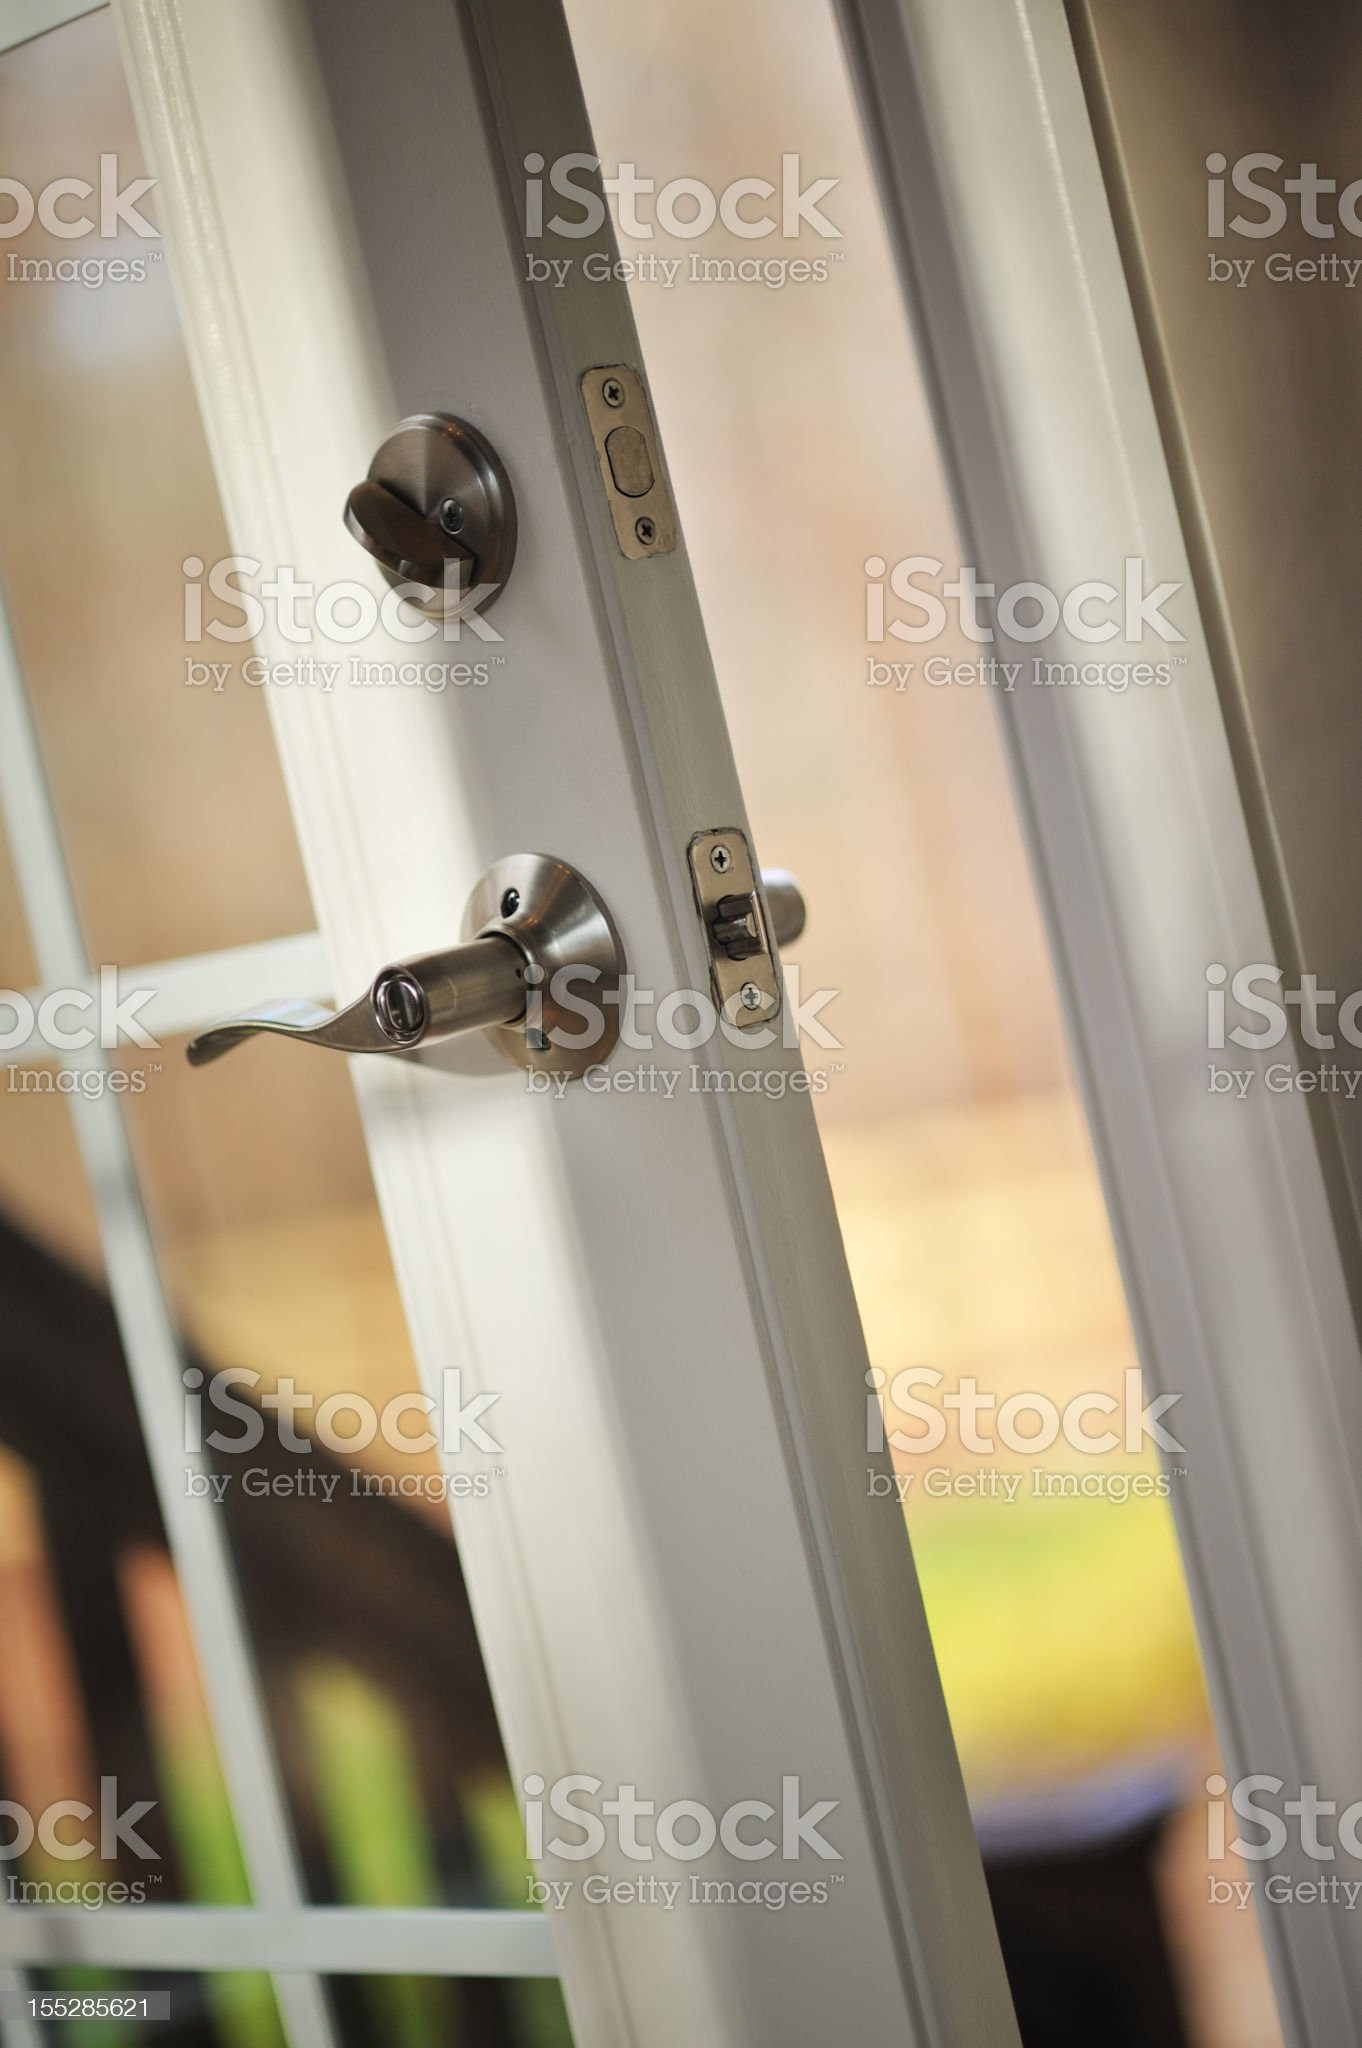 Open Door To House. royalty-free stock photo